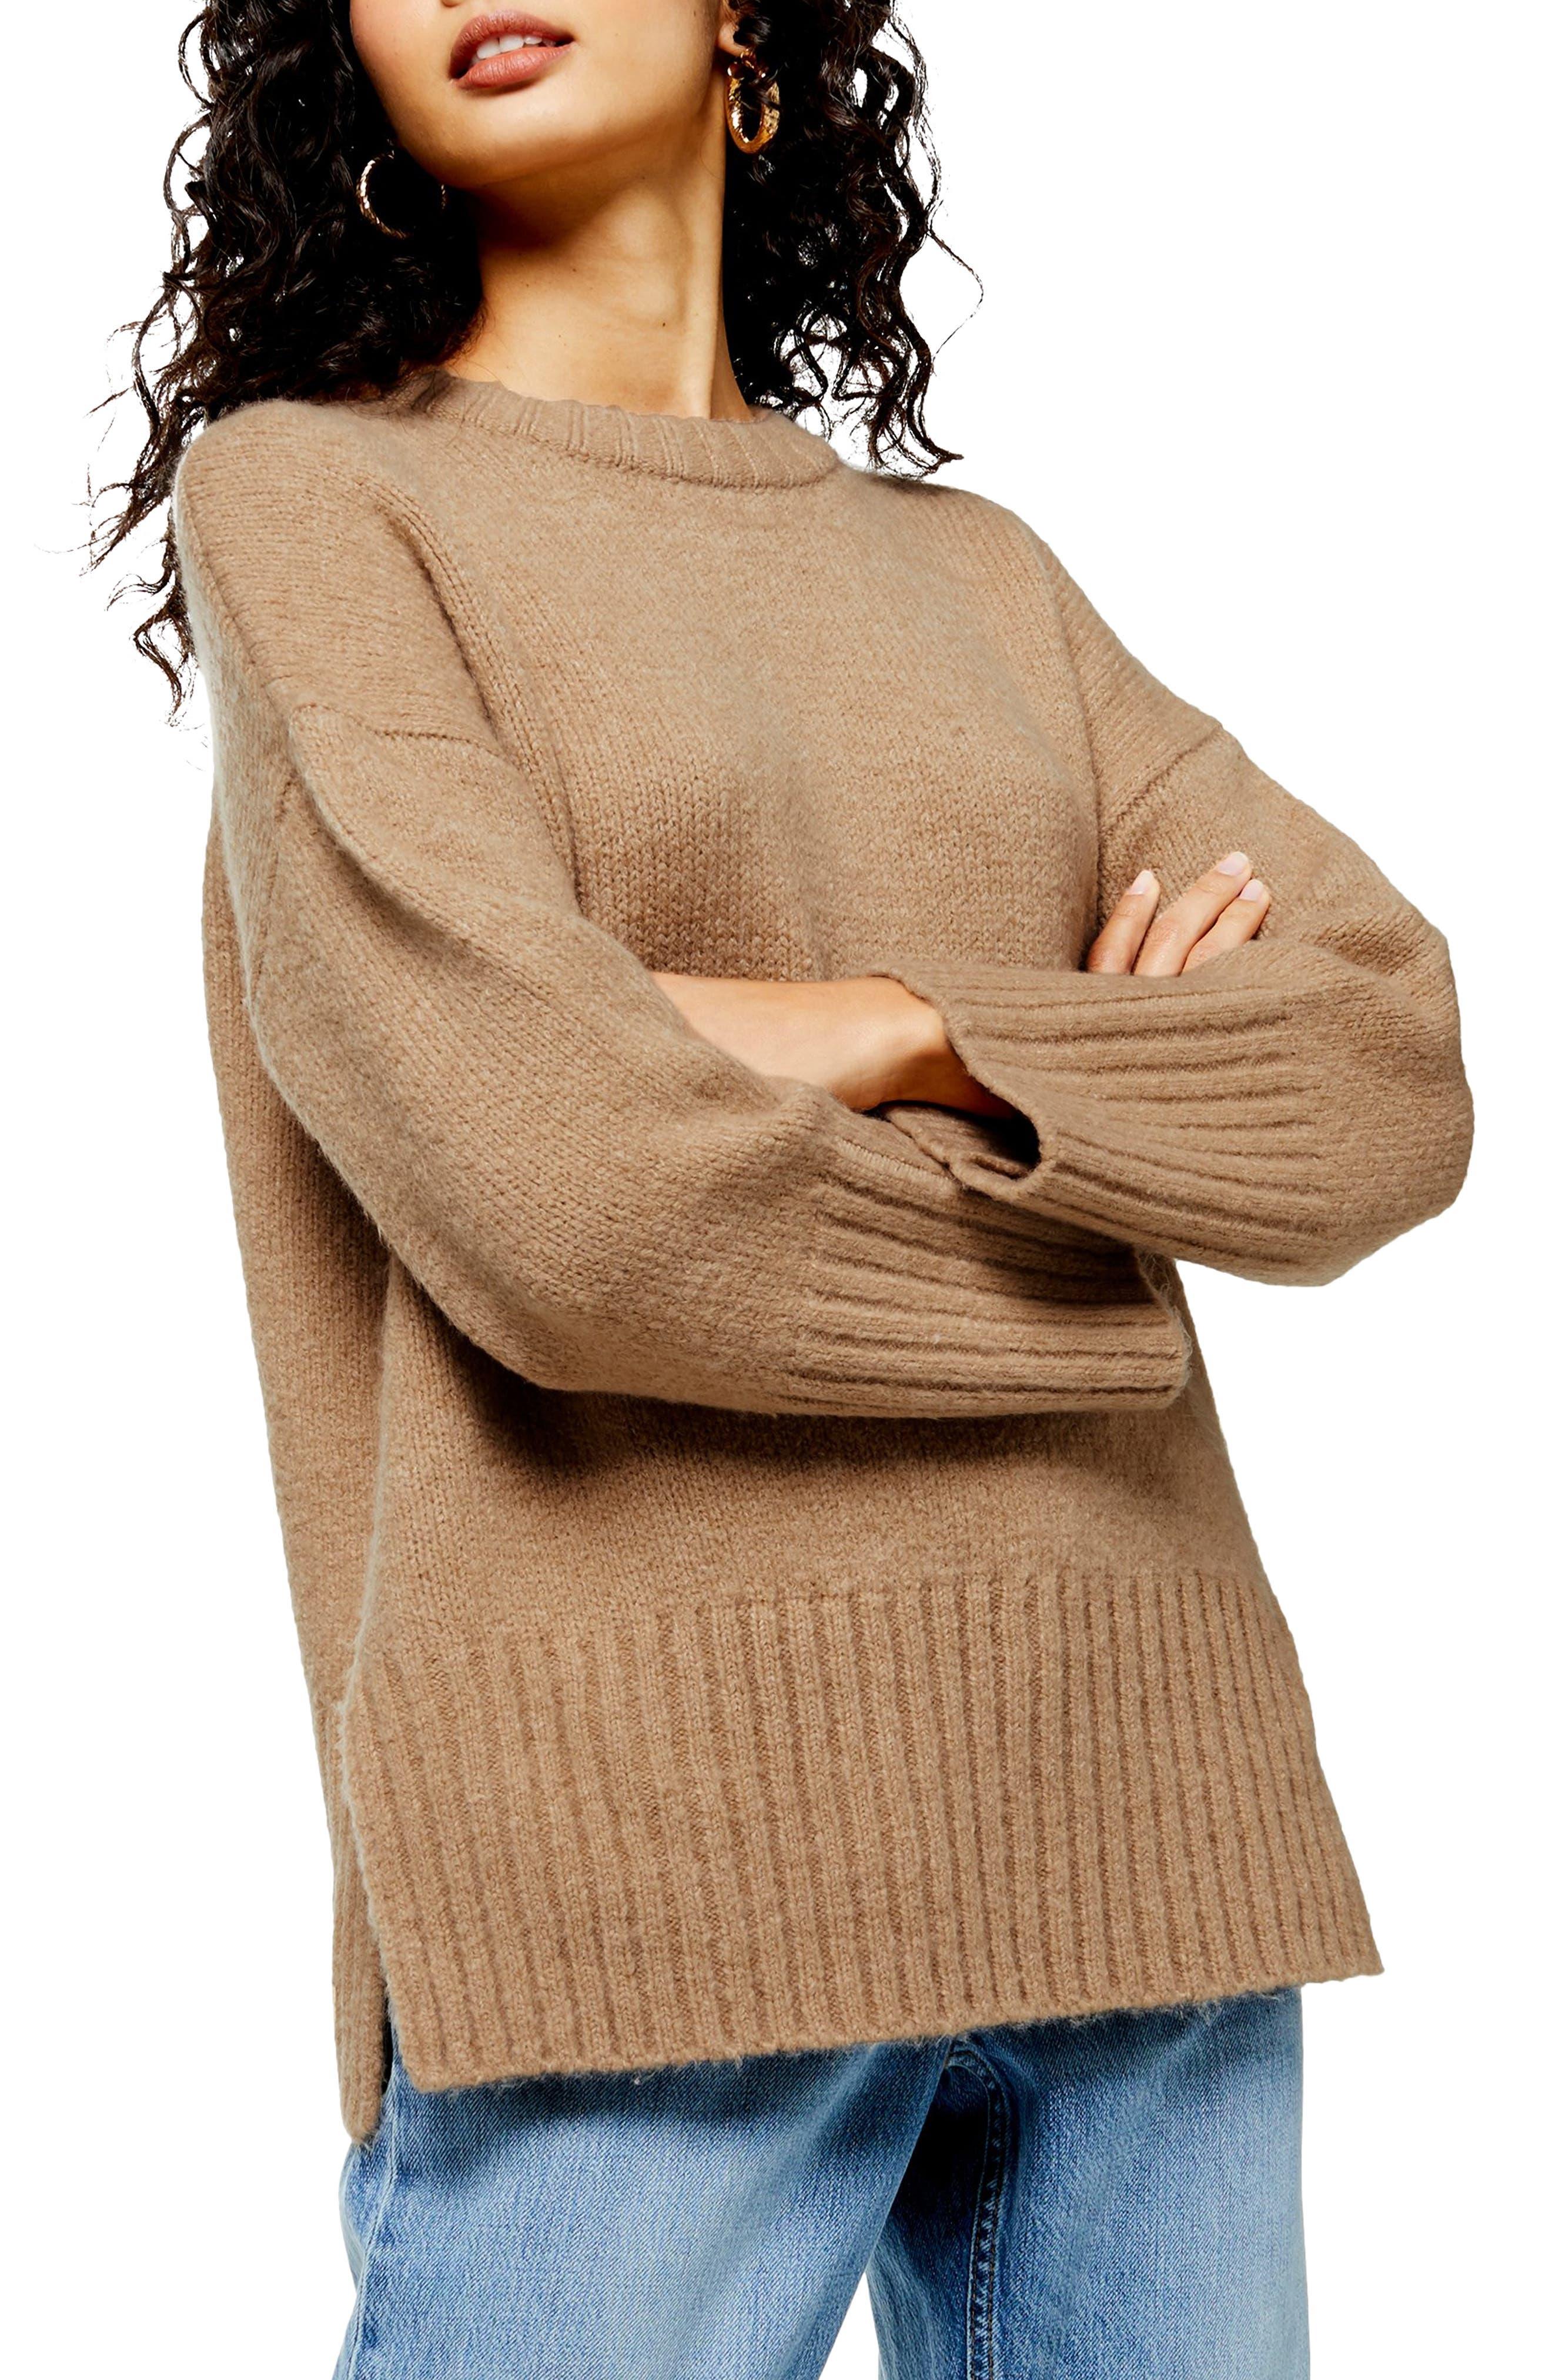 Topshop Supersoft Deep Hem Crewneck Sweater